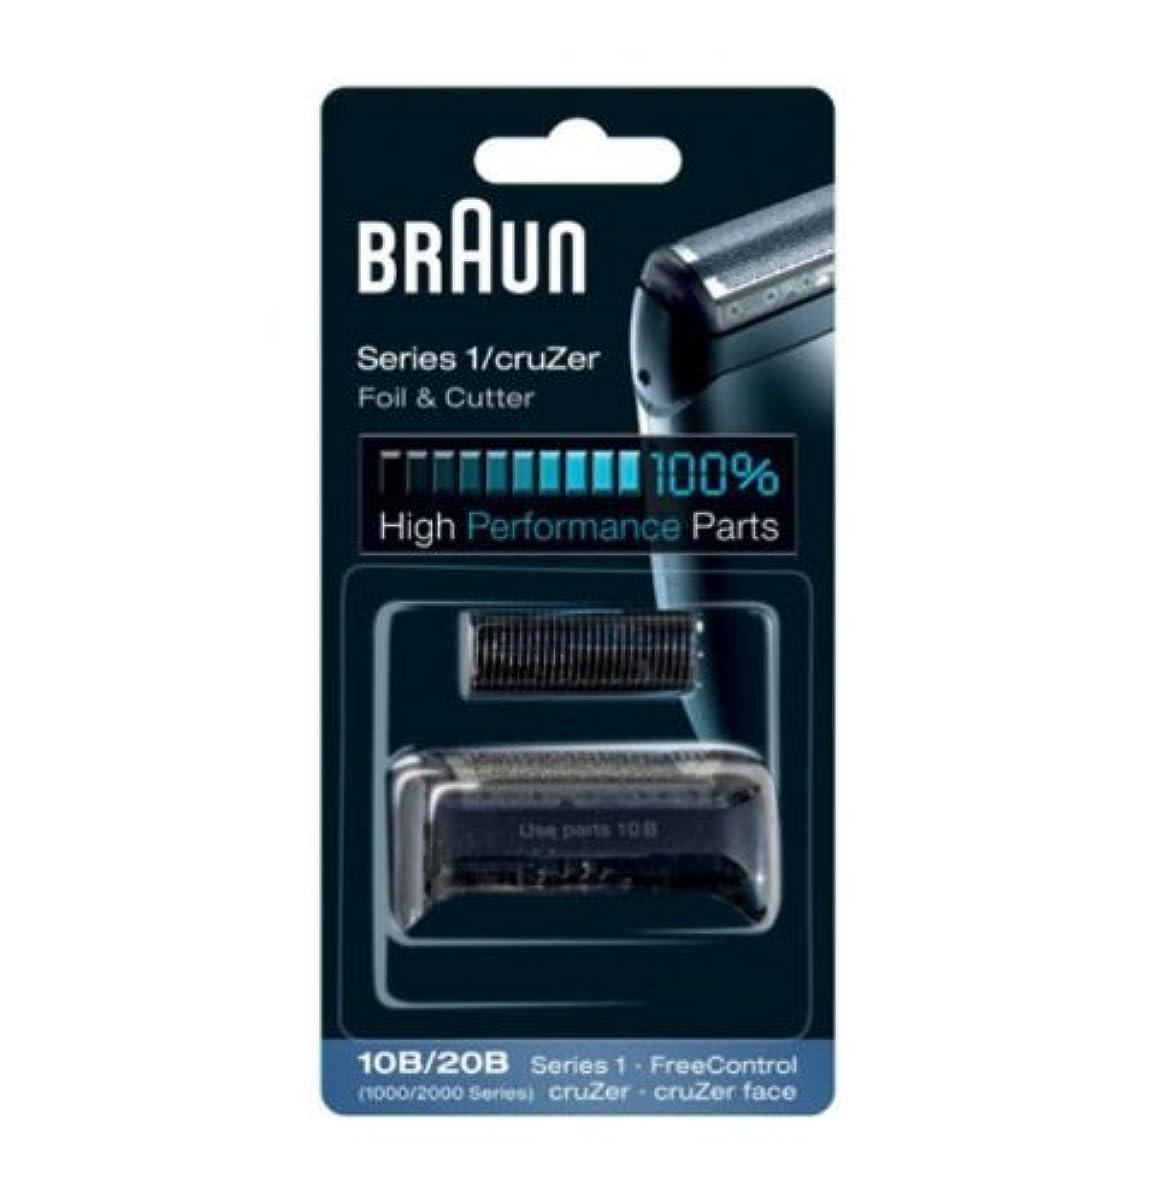 花婿節約変形するBraun Replacement Foil & Cutter - 10B, Series 1,FreeControl - 1000 Series by Braun [並行輸入品]